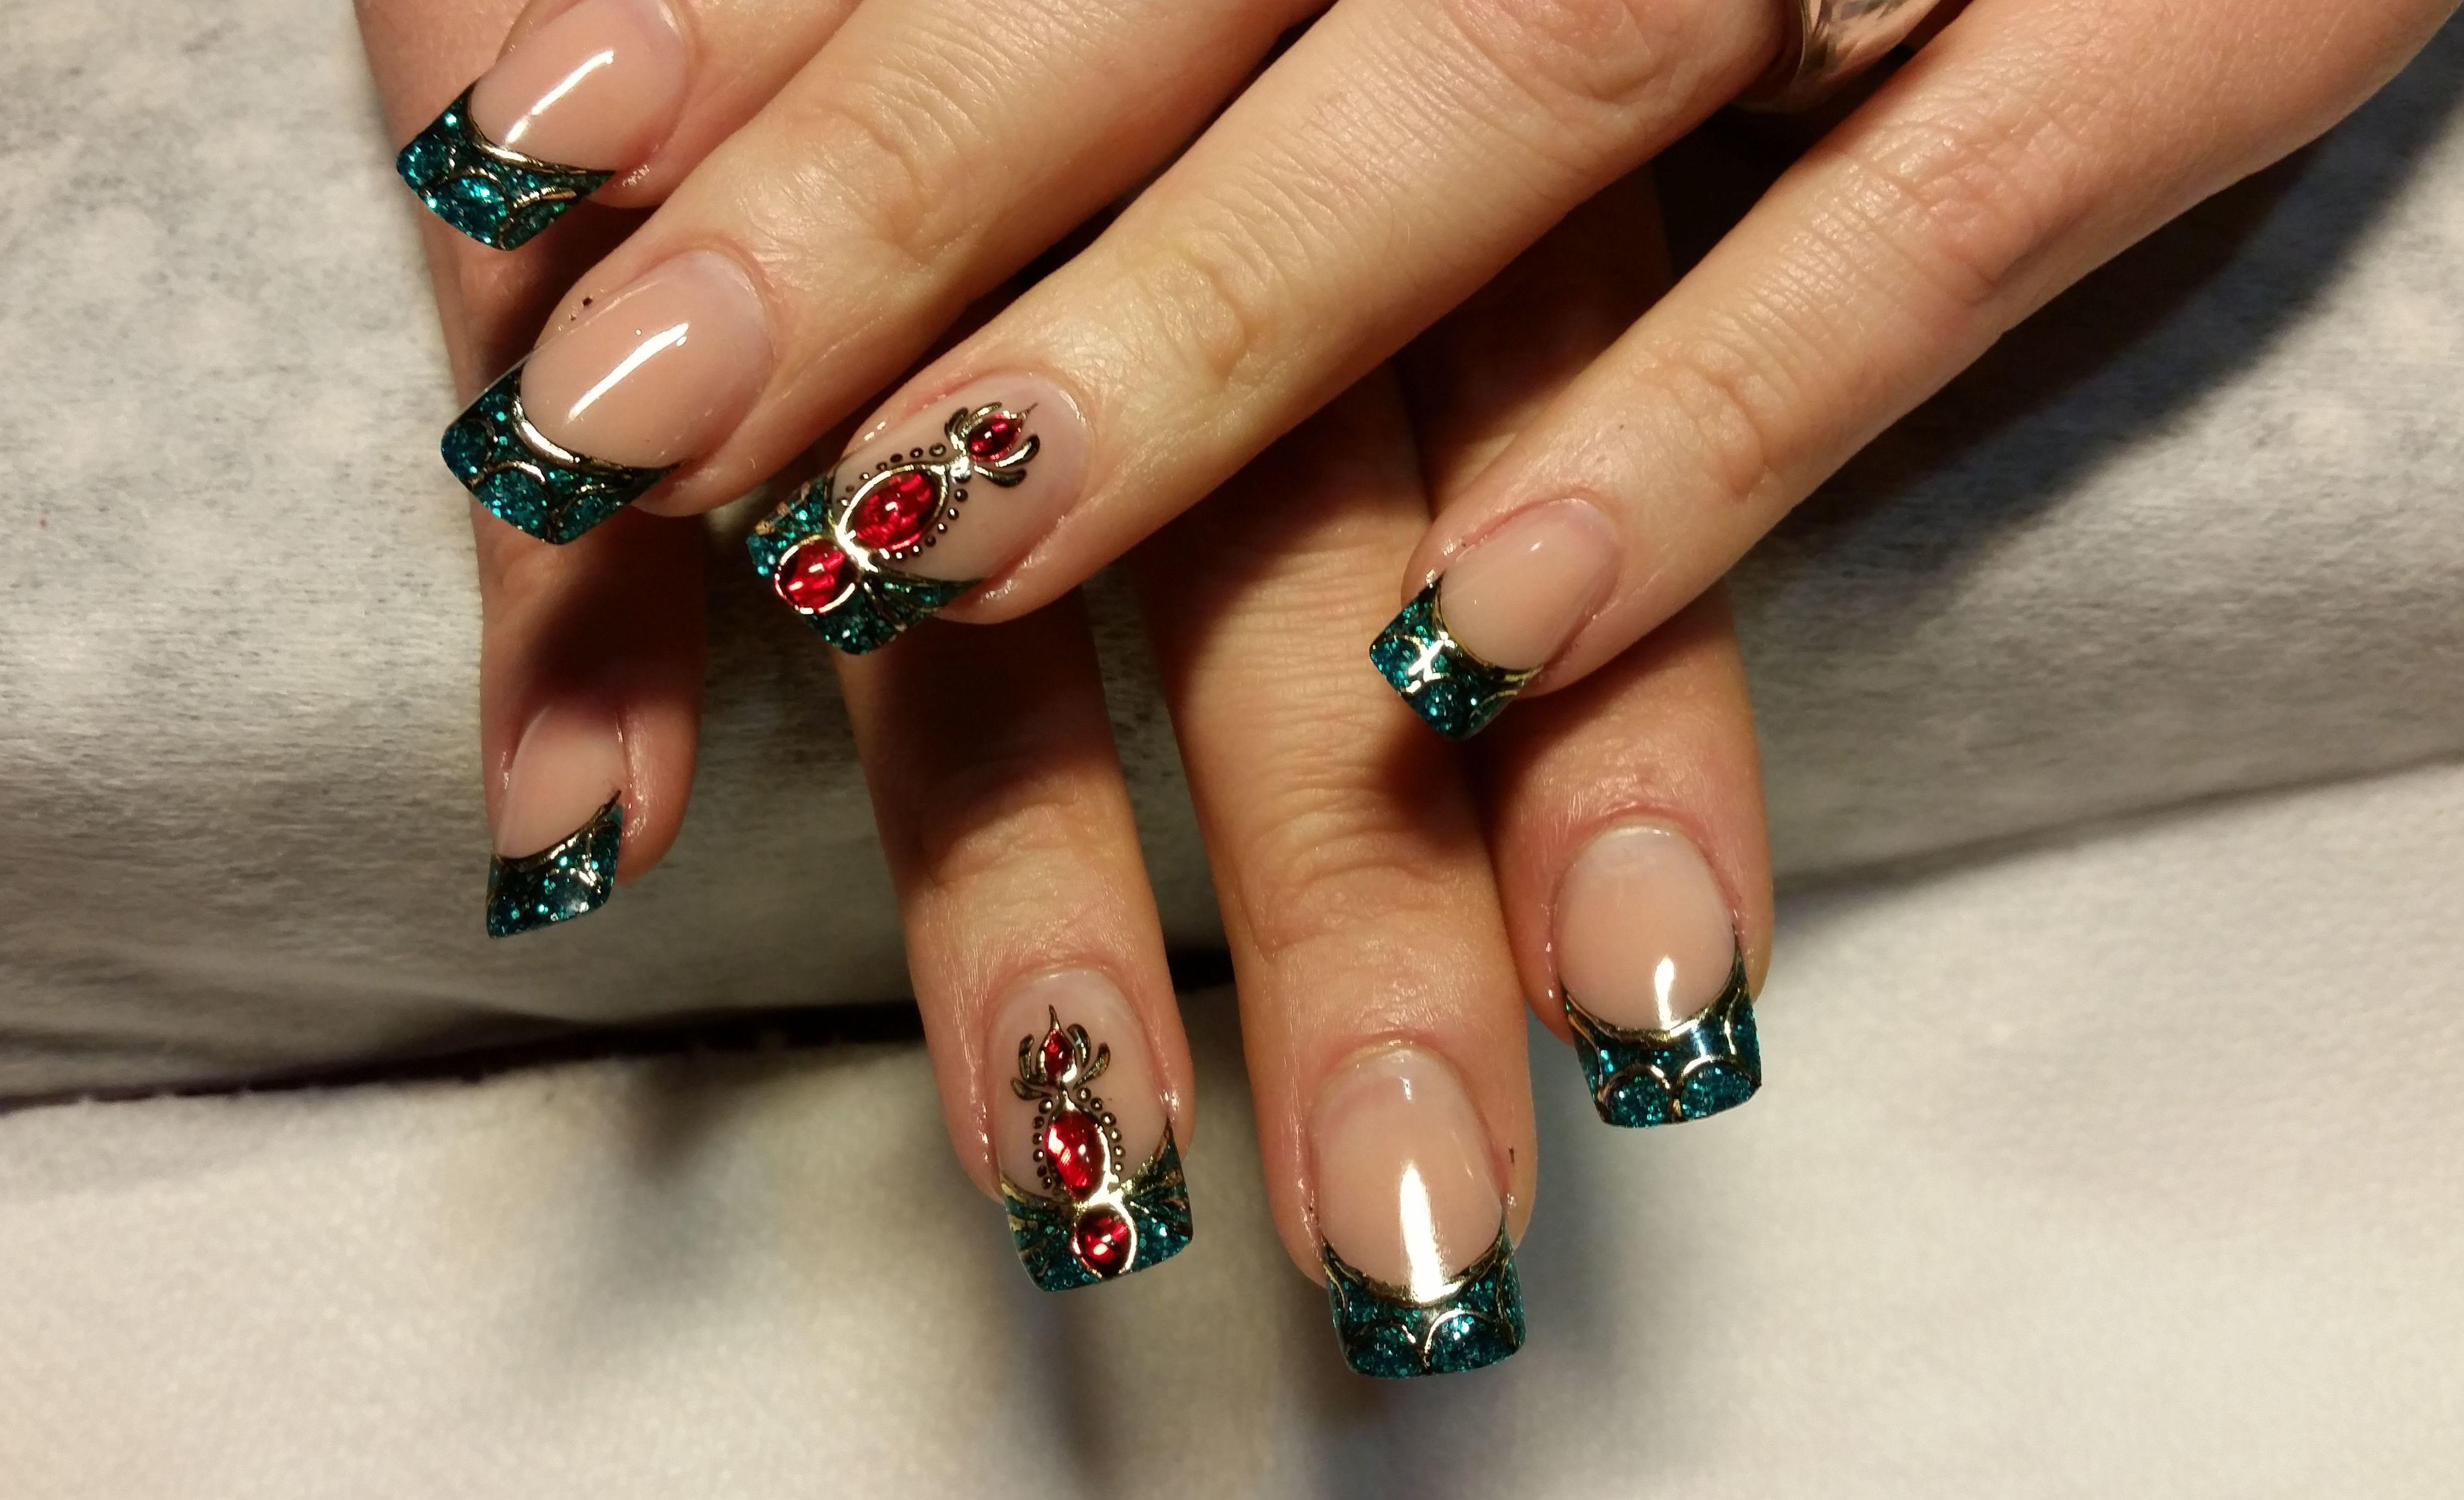 Relleno de uñas acrilicas fantasia Natali nail art studio leganes